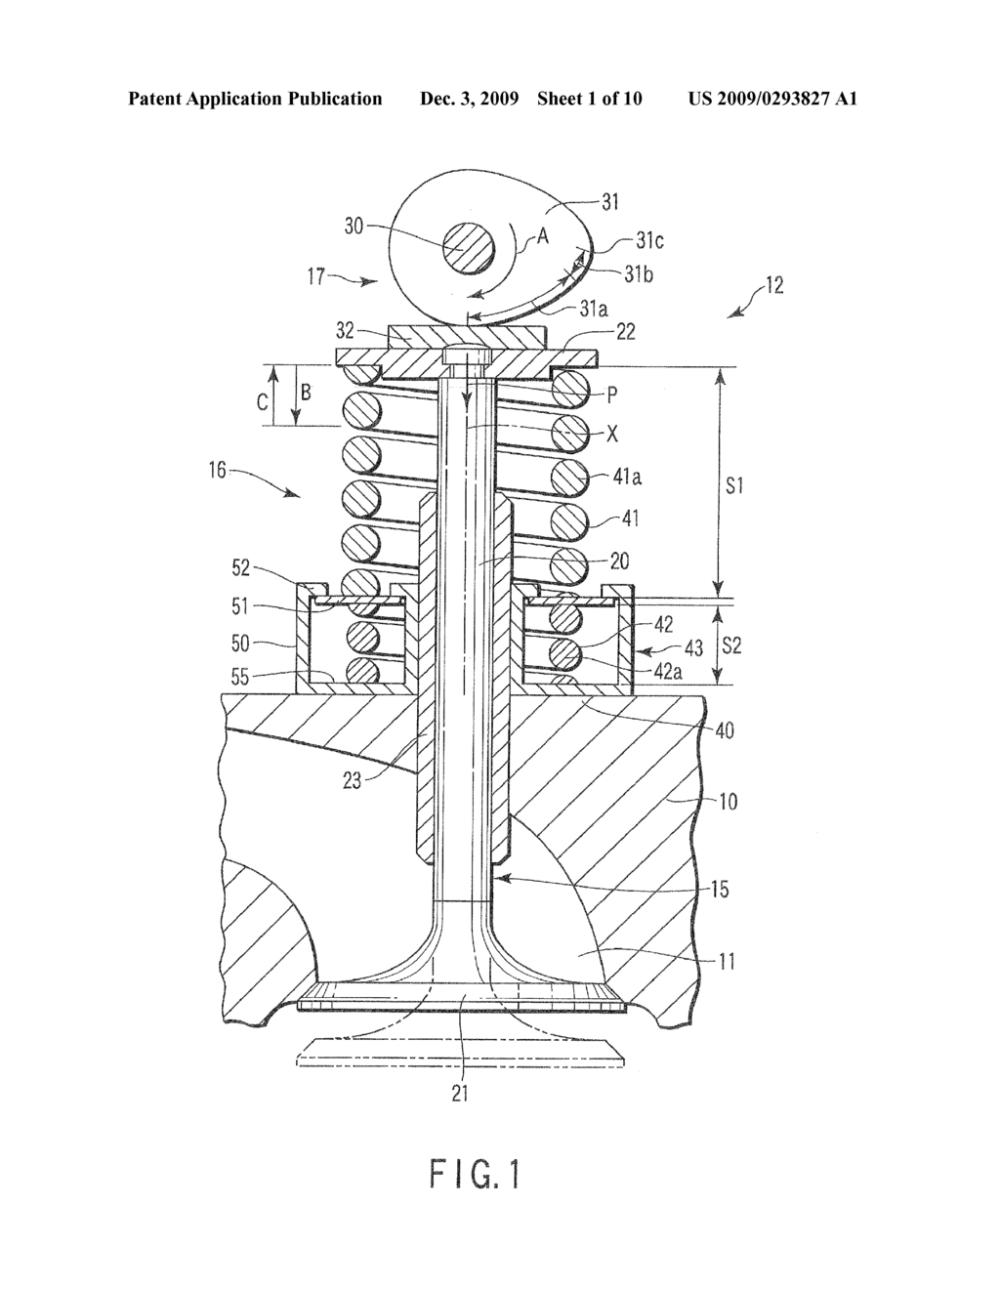 medium resolution of engine valve train diagram wiring library rh 11 mml partners de engine valve components engine valve